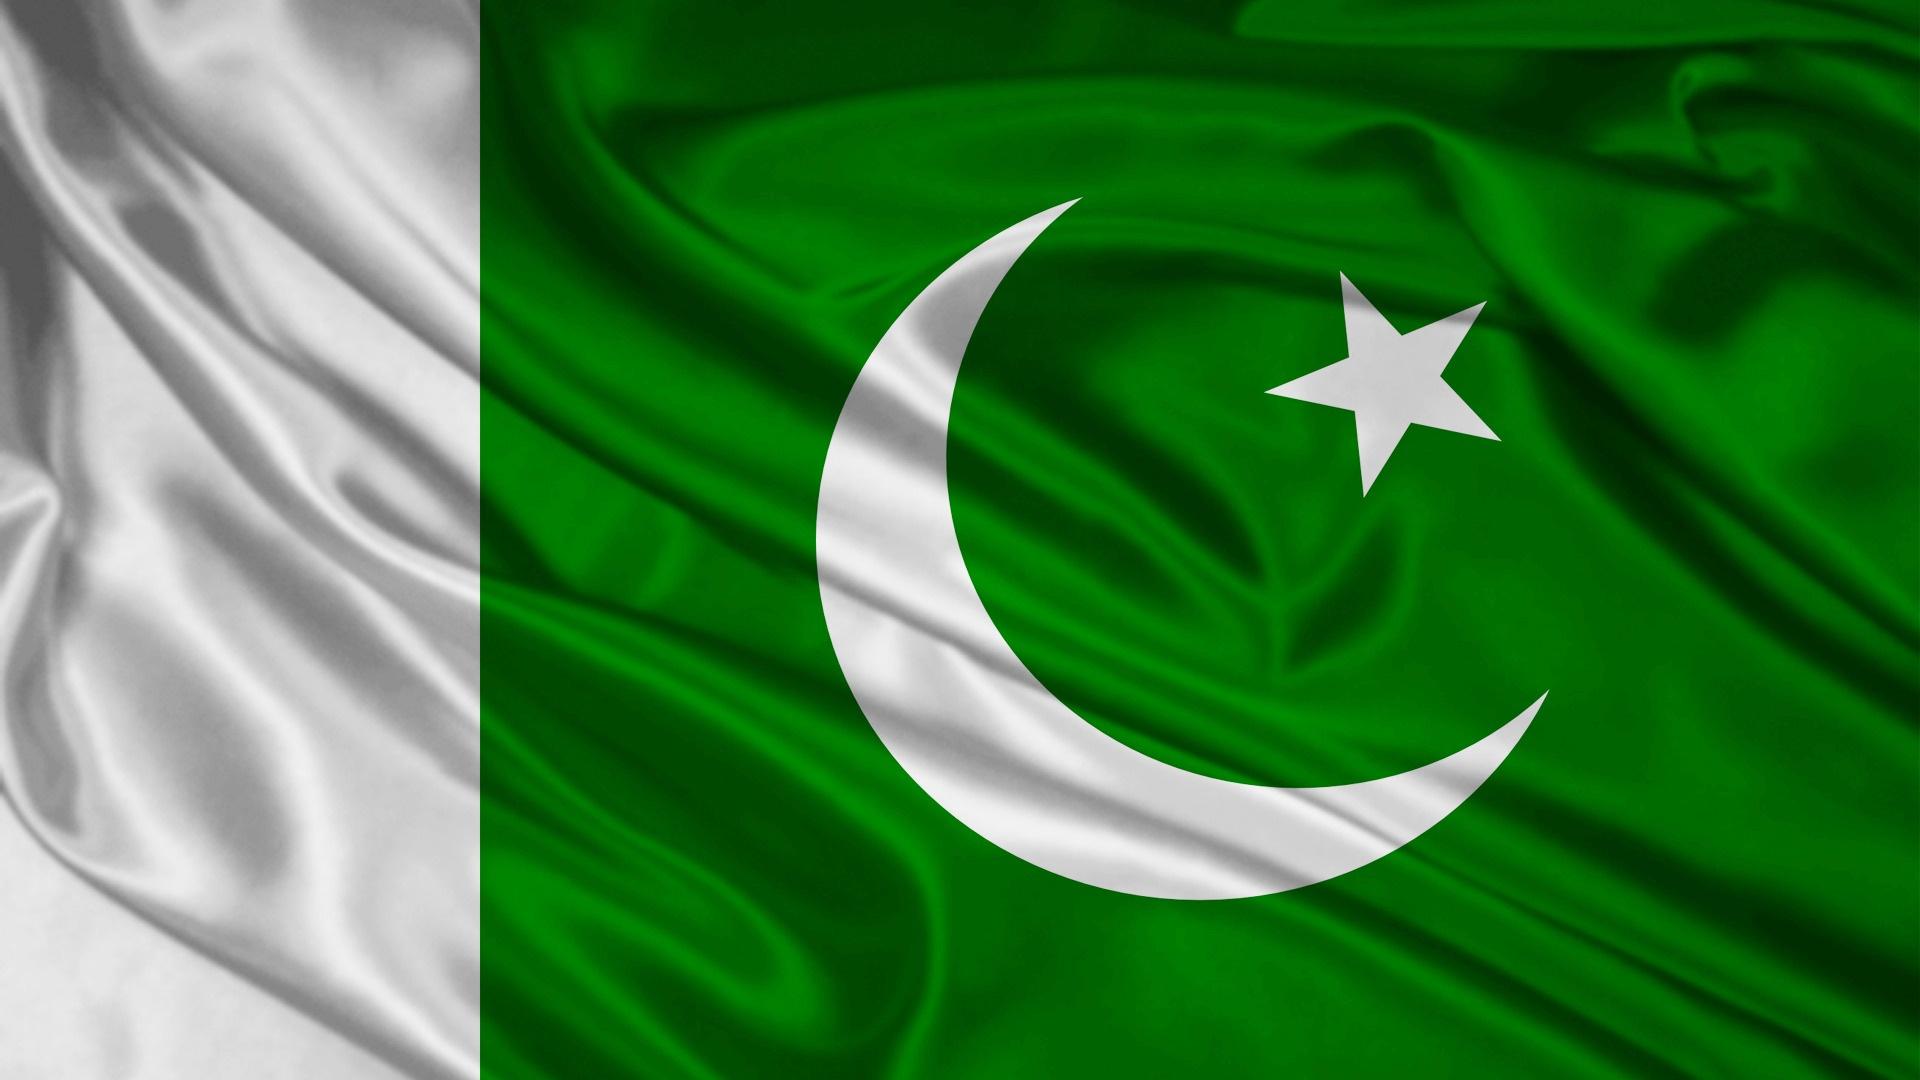 Shukriya Pakistan Logo Banner Poster wallpaper tshirts designs (4)